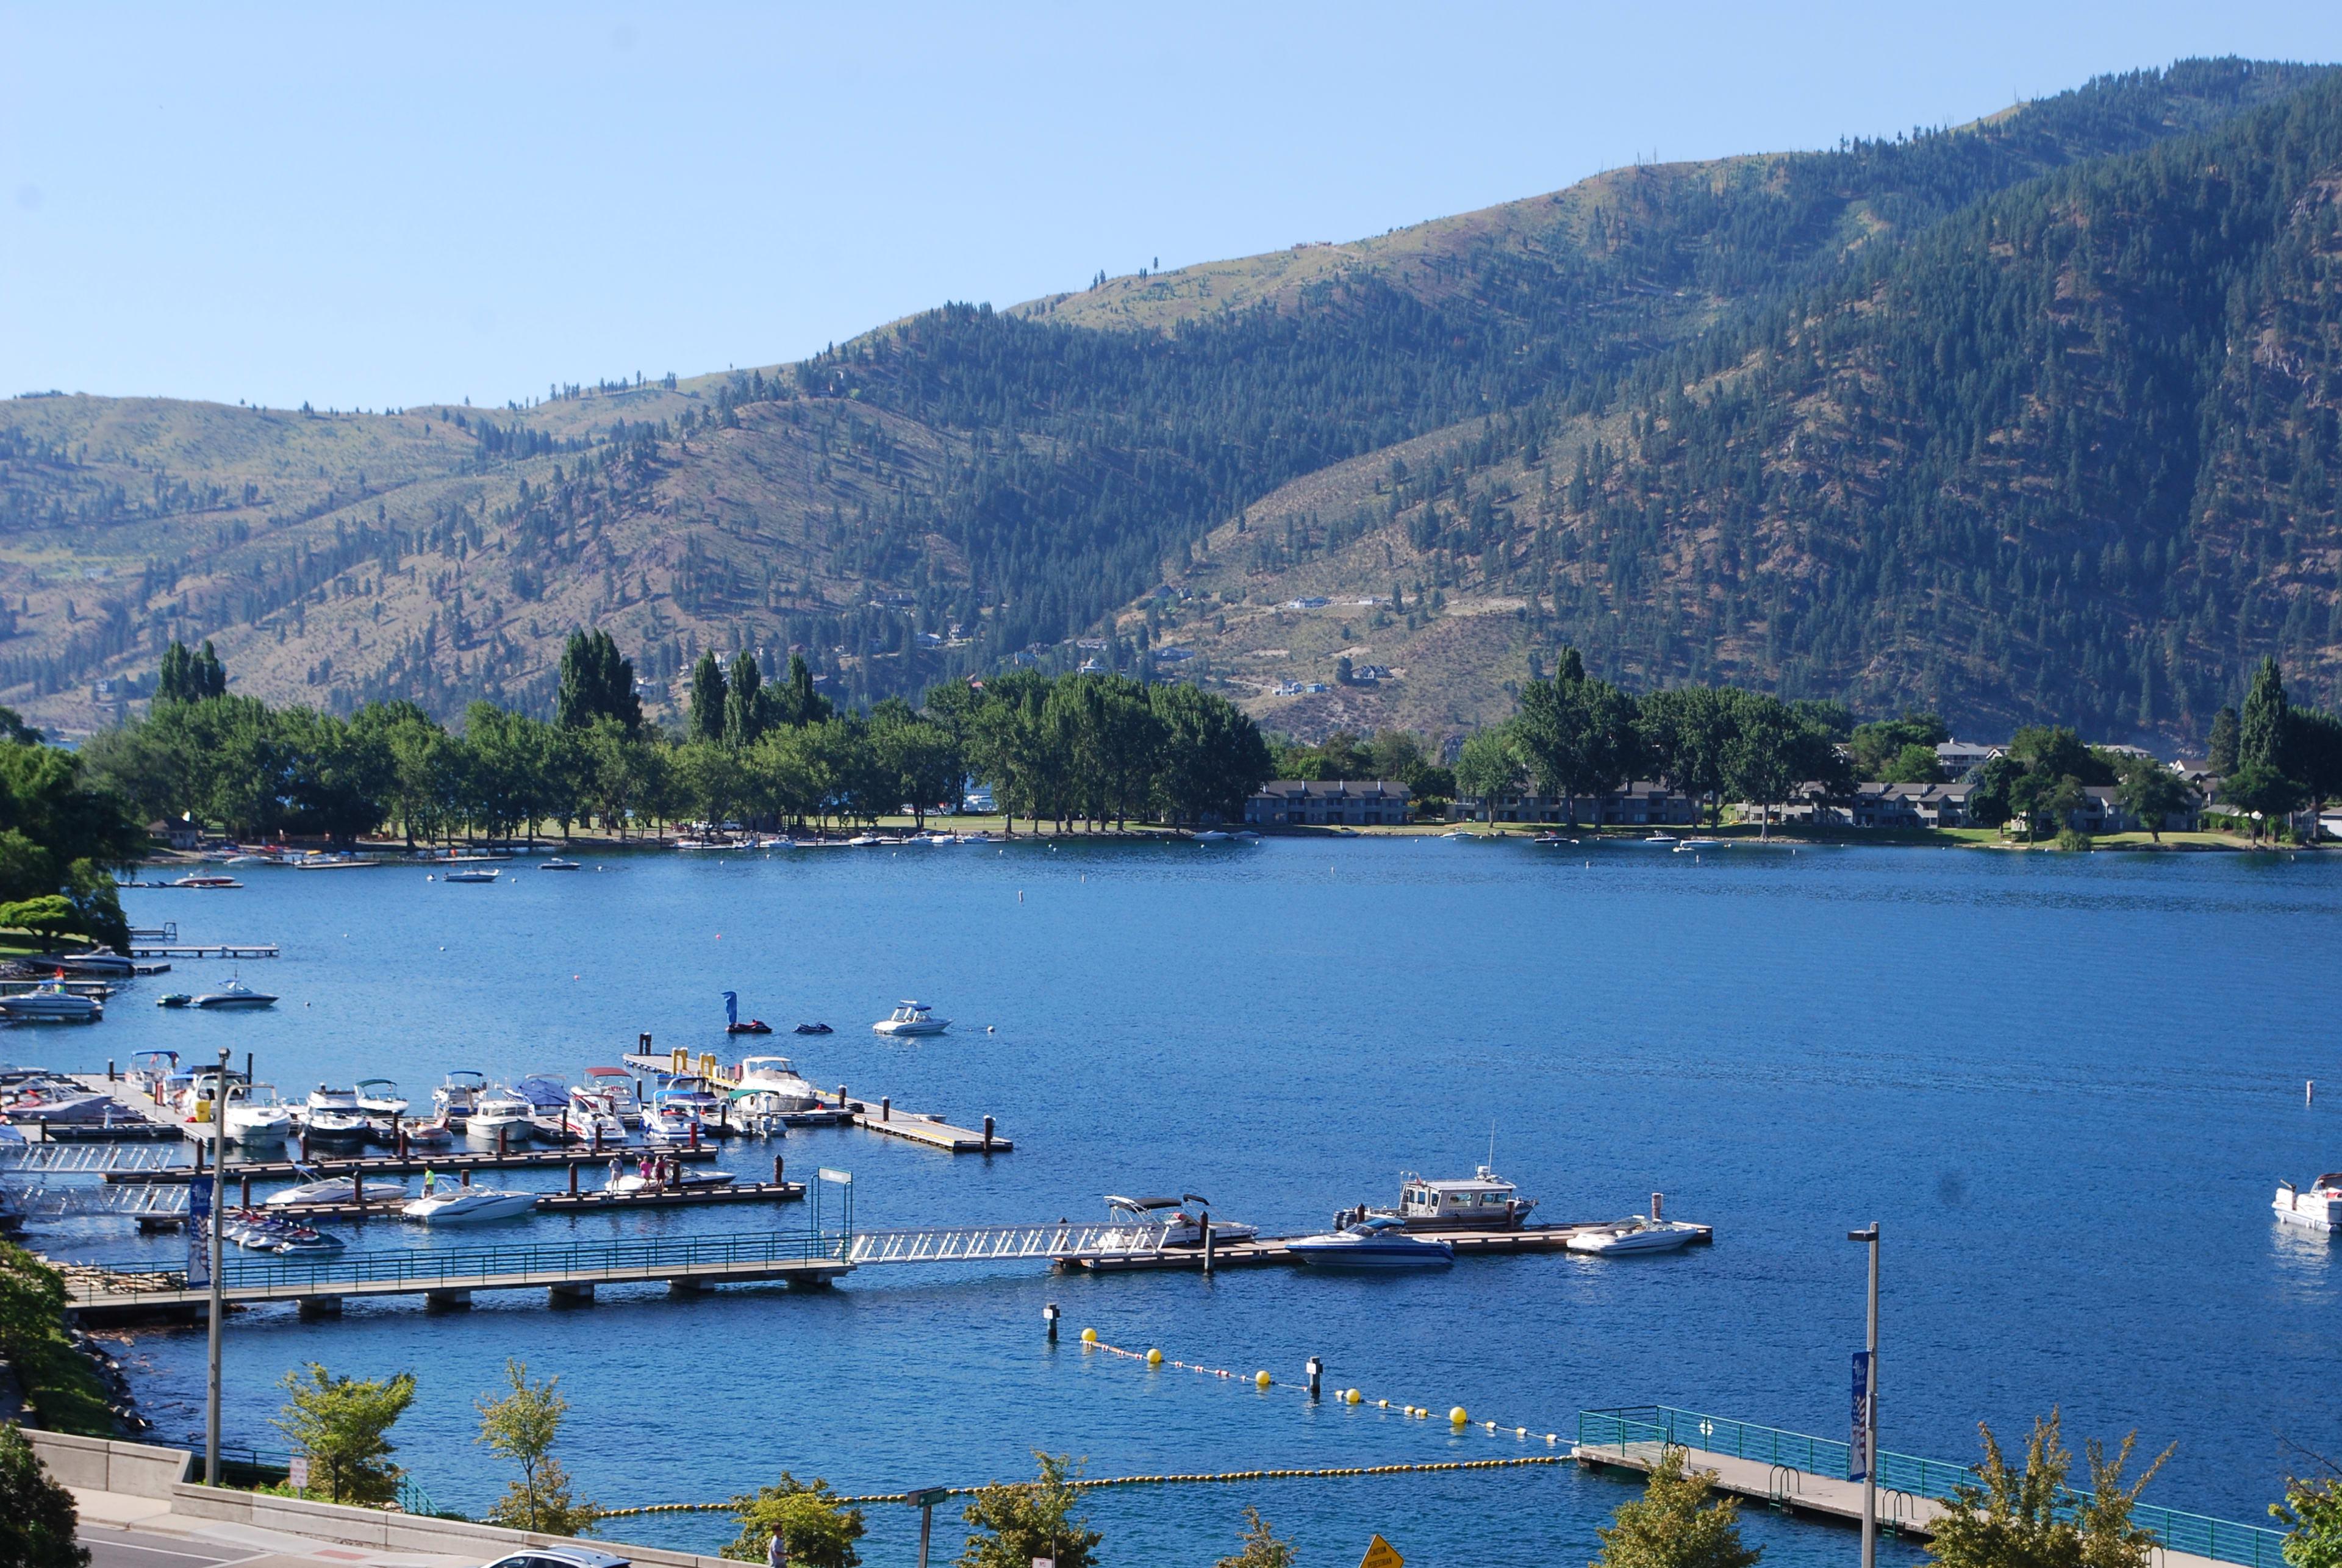 Marvel at the spectacular Lake Chelan views